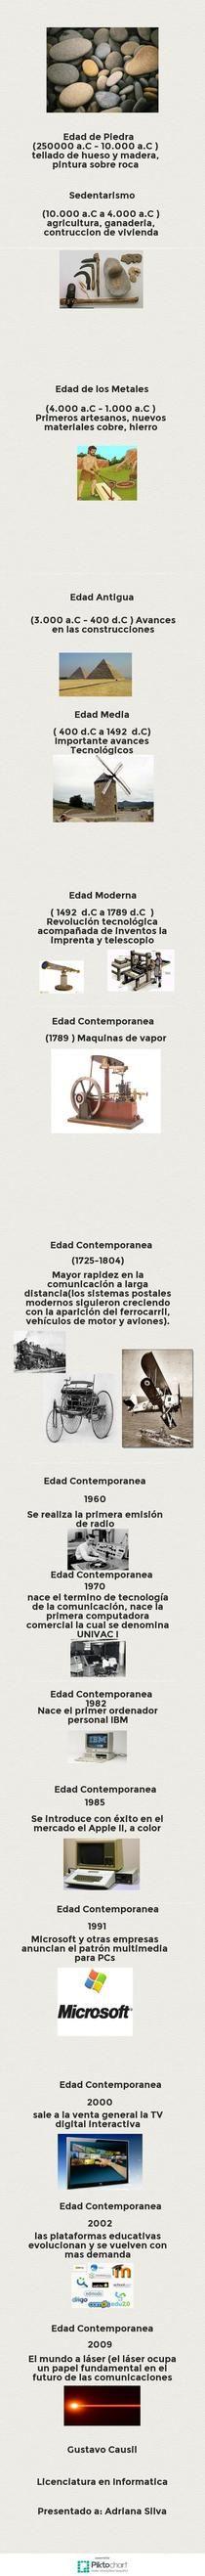 Epistemología e historia de la Tecnología | Piktochart Infographic Editor